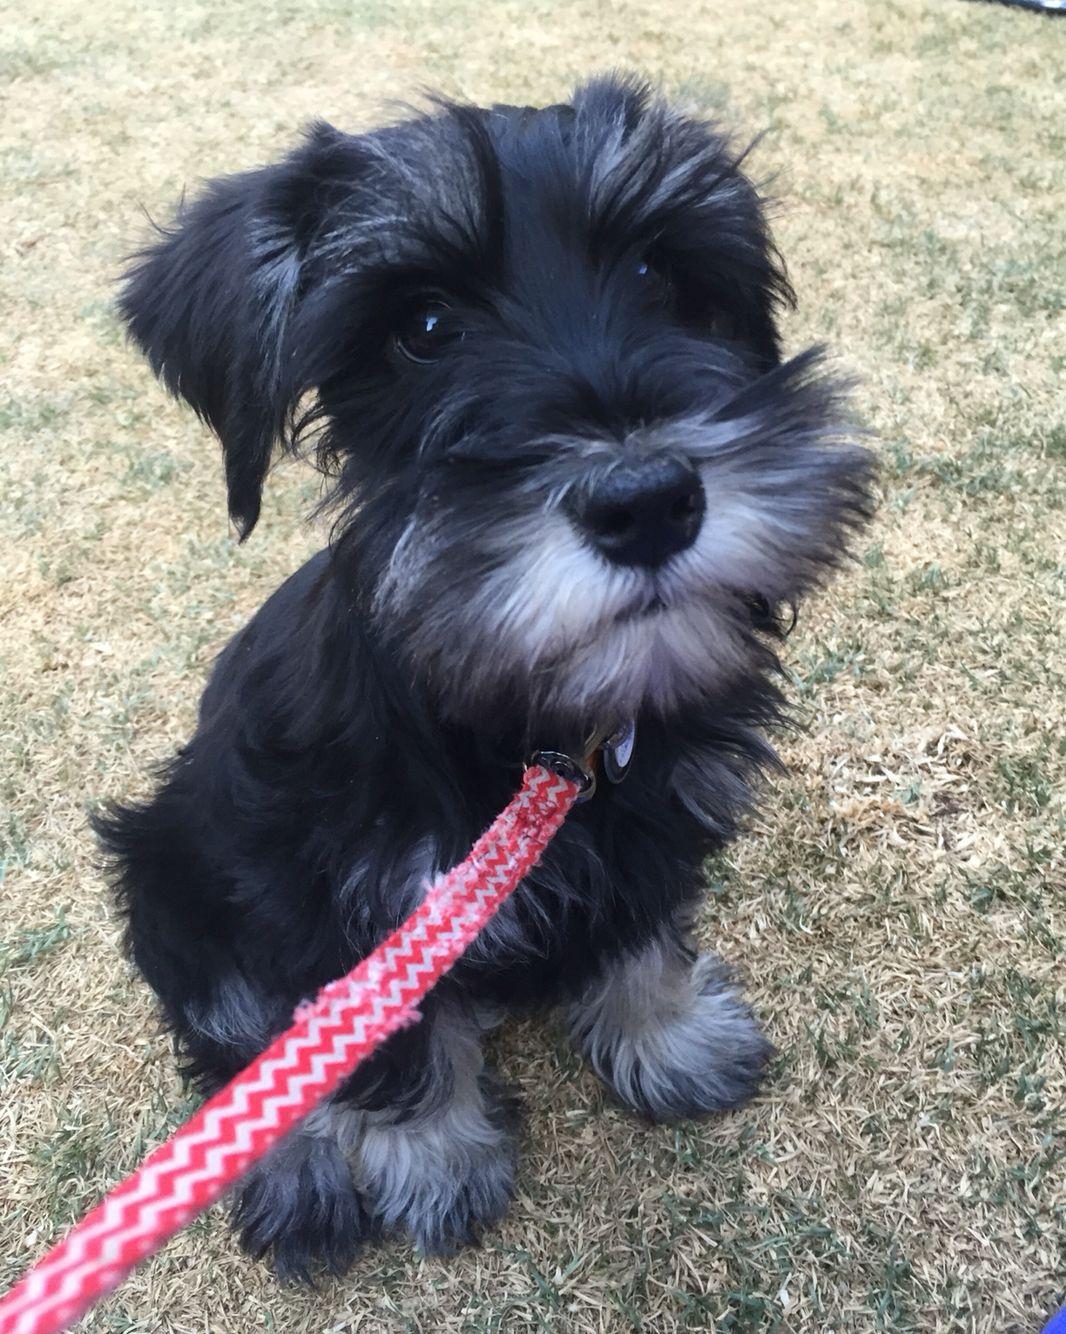 Puppy school Puppy training, Training your dog, Training